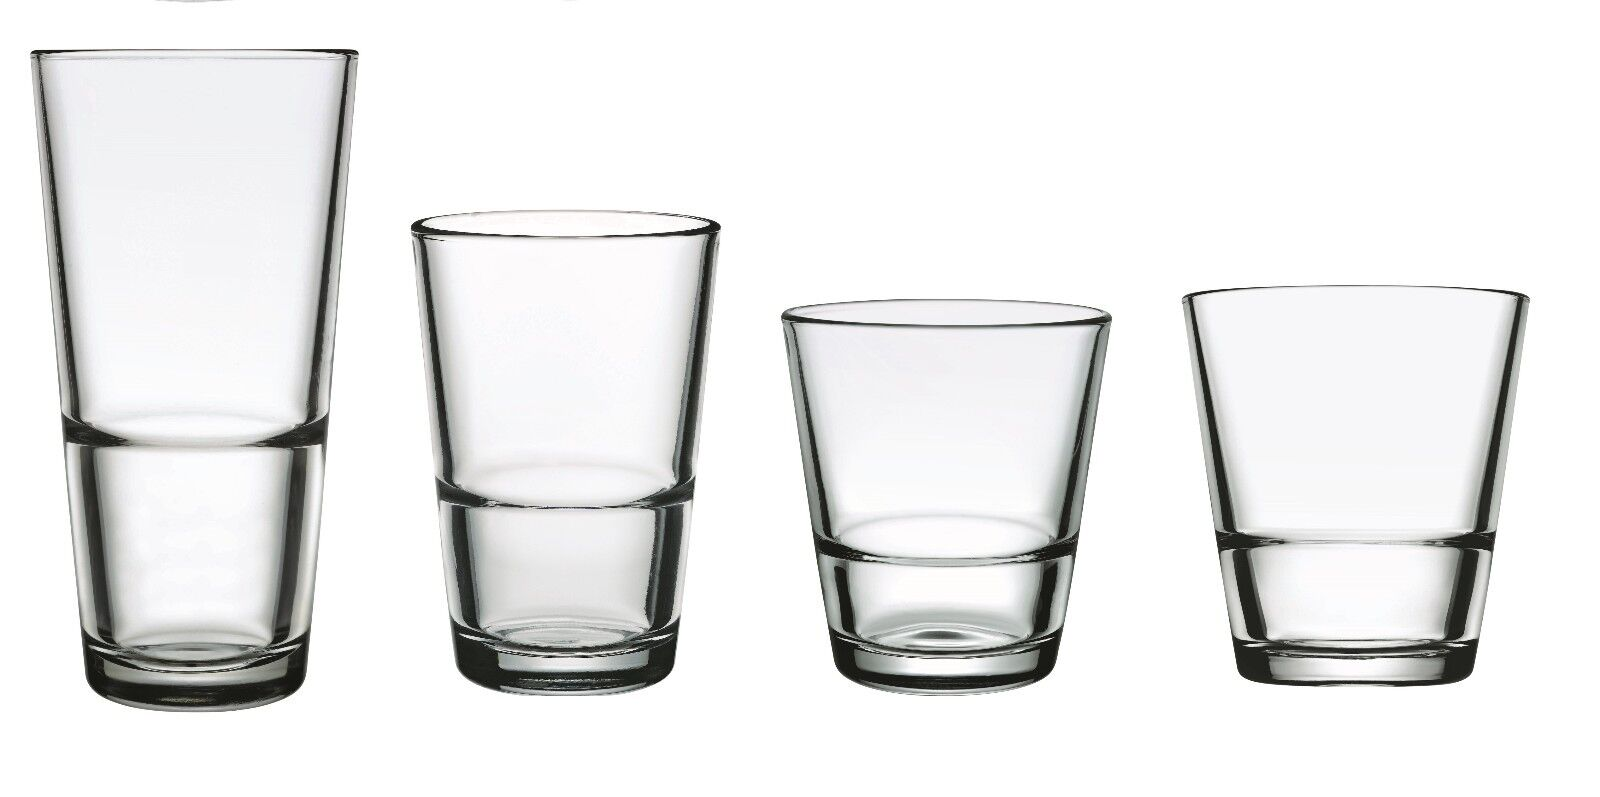 Occhiali, Serie di vetro East, ACQUA WHISKY O bicchiere highball a scelta,